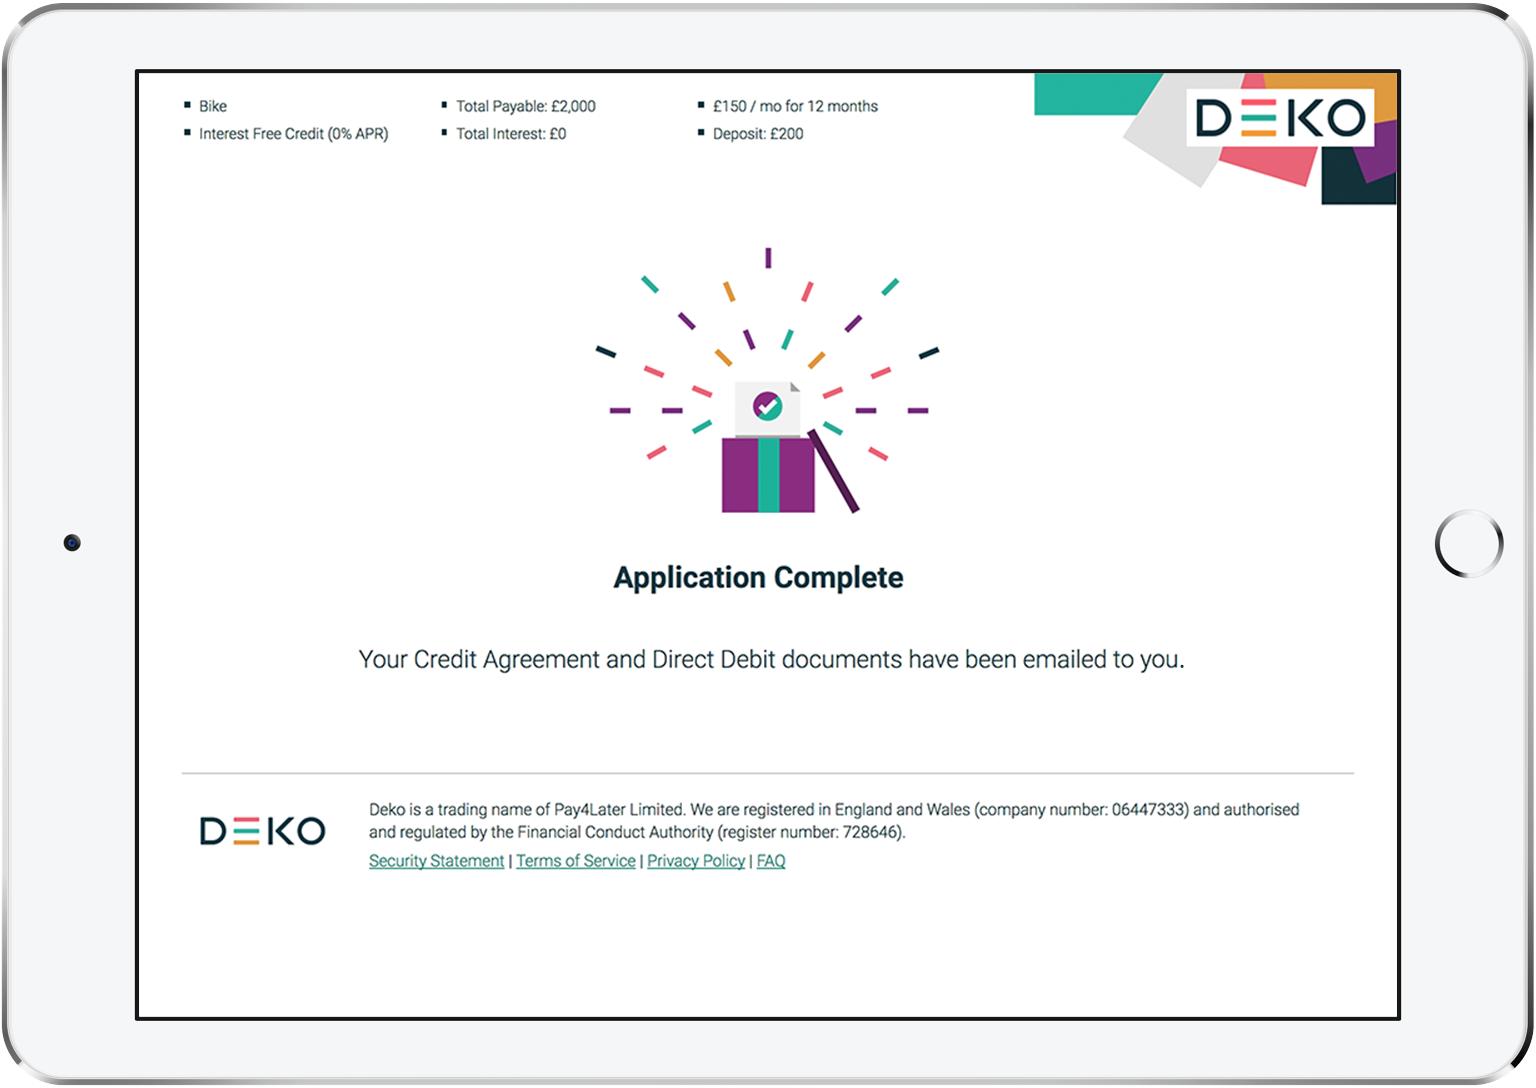 Deko The Smart Choice For Consumer Finance